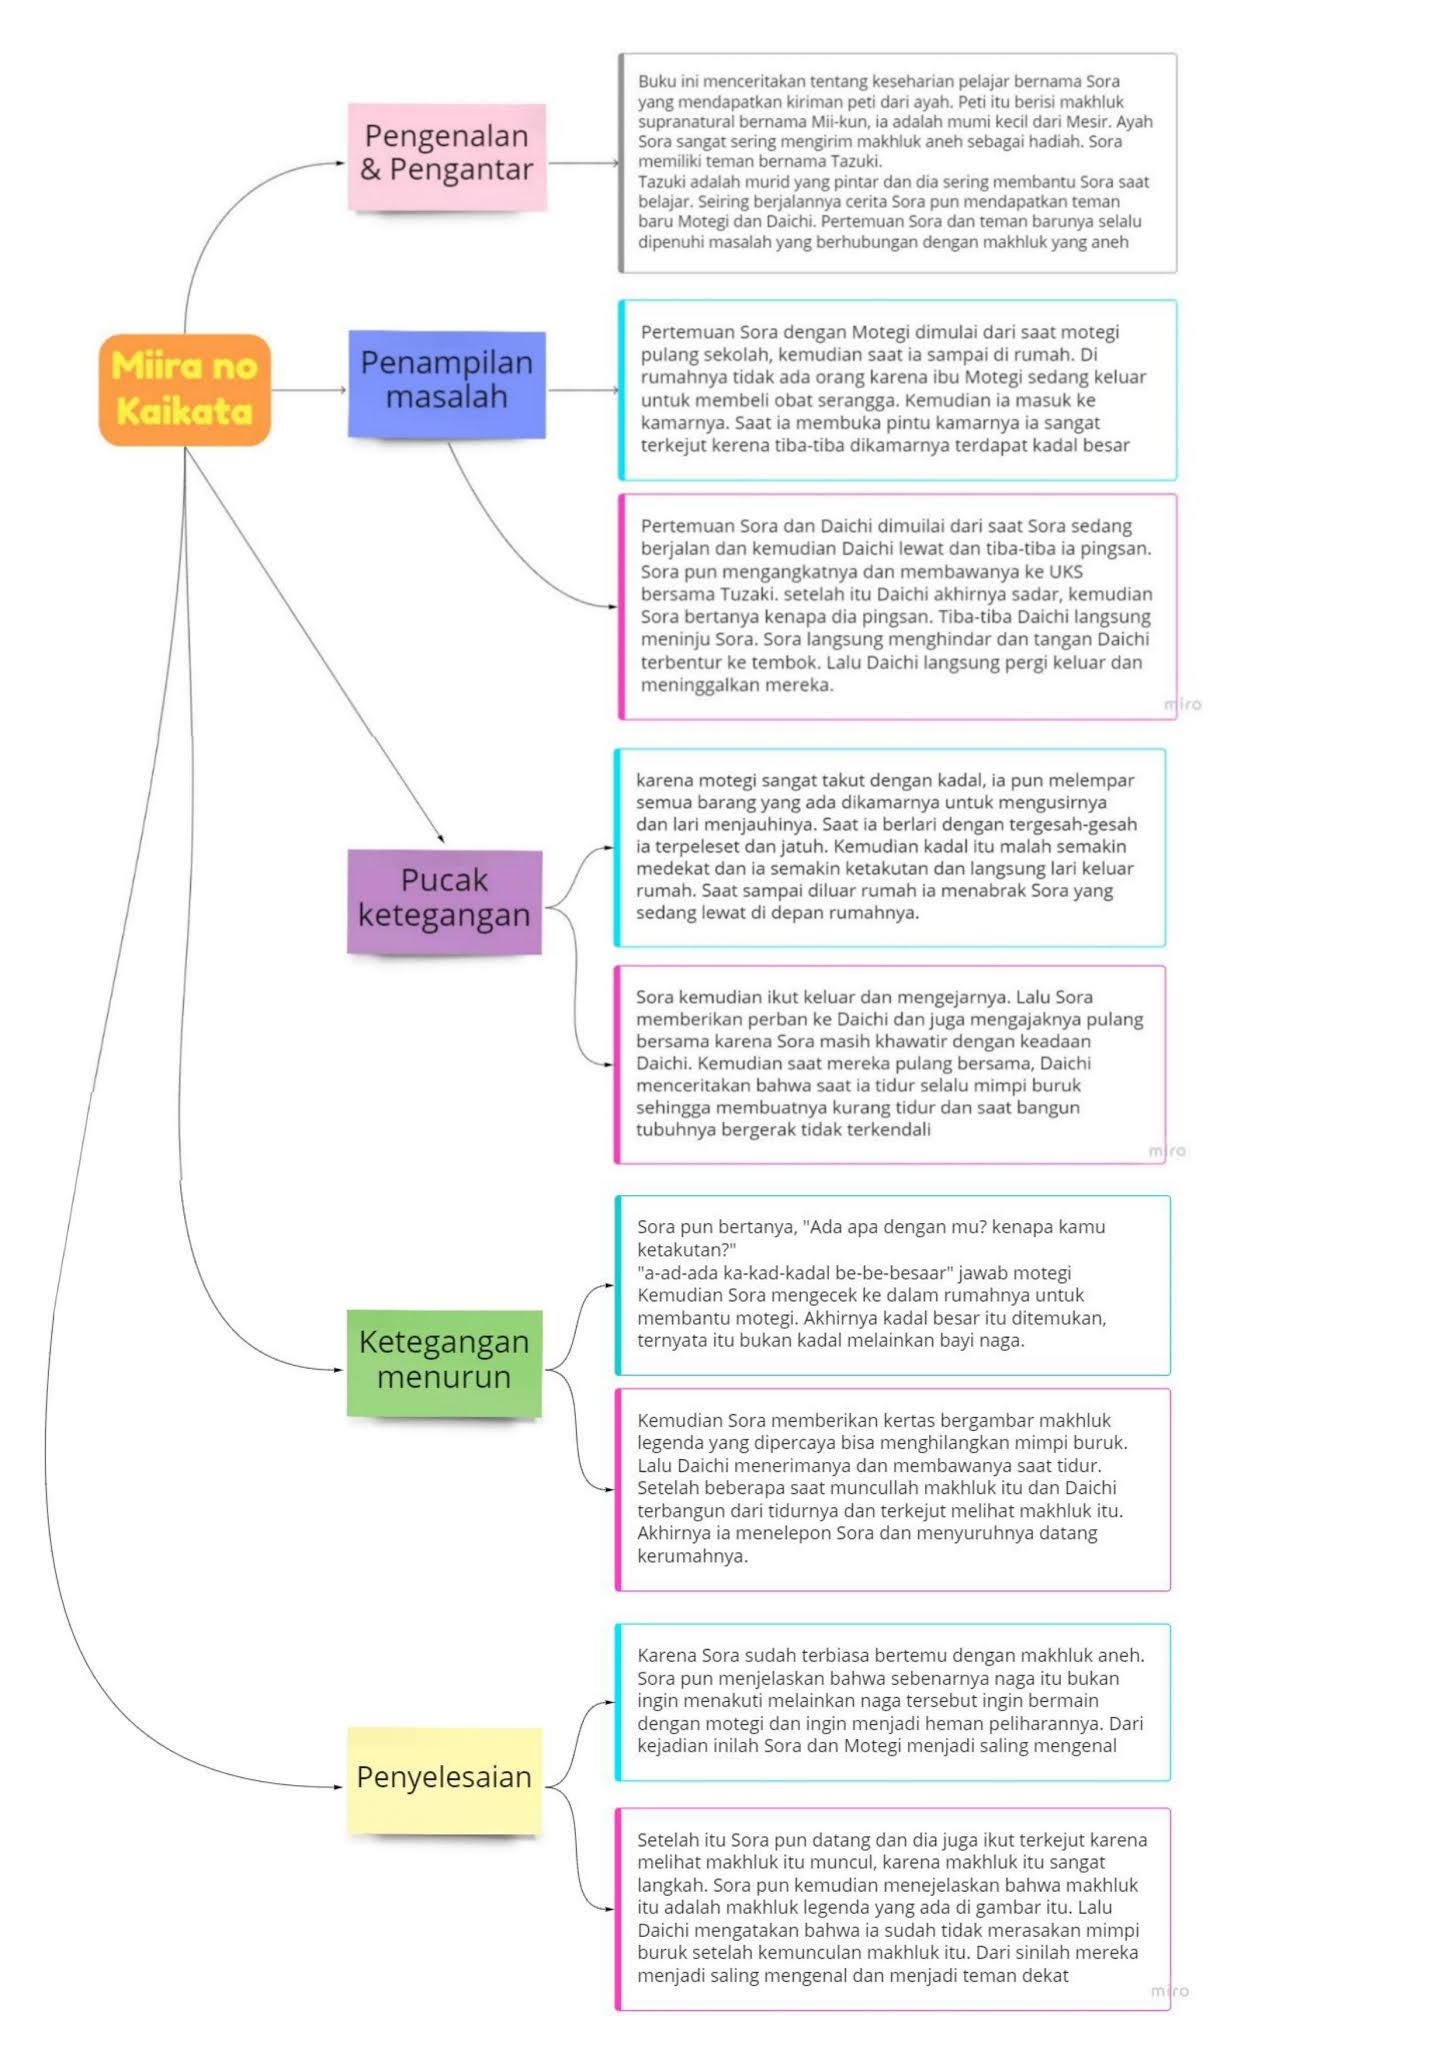 peta konsep buku fiksi peta konsep buku non fiksi peta konsep buku fiksi dan nonfiksi kelas 8 peta konsep buku fiksi laskar pelangi peta konsep buku fiksi cinderella peta konsep buku fiksi dan nonfiksi peta konsep buku fiksi cerpen peta konsep buku bahasa indonesia kelas 8 peta konsep buku adalah peta konsep buku apresiasi sastra peta konsep alur buku fiksi dan nonfiksi peta konsep alur buku fiksi peta konsep isi buku adalah peta konsep buku fiksi adalah peta konsep buku fiksi atau nonfiksi jelaskan alur peta konsep buku fiksi contoh peta konsep buku peta konsep buku bahasa indonesia kelas 8 semester 2 peta konsep buku bahasa indonesia kelas 9 peta konsep buku biografi peta konsep buku bumi manusia peta konsep buku bahasa indonesia kelas 7 peta konsep buku bahasa indonesia kelas 9 kurikulum 2013 peta konsep buku bj habibie peta konsep buku cerita peta konsep buku cerita fiksi peta konsep buku cinderella peta konsep buku cerpen contoh peta konsep buku non fiksi contoh peta konsep buku fiksi dongeng contoh peta konsep buku pelajaran cara membuat peta konsep buku peta konsep buku dilan peta konsep buku dongeng peta konsep buku digital peta konsep buku dibuat untuk peta konsep dari buku fiksi peta konsep dari buku non fiksi peta konsep di buku tulis peta konsep dalam buku peta konsep buku ensiklopedia buku peta konsep ekonomi peta konsep buku fiksi sang pemimpi peta konsep buku fiksi dan nonfiksi kelas 7 gambar peta konsep buku fiksi dan nonfiksi gambar peta konsep buku non fiksi contoh gambar peta konsep buku fiksi contoh gambar peta konsep buku non fiksi contoh gambar peta konsep buku fiksi dan nonfiksi gambar peta konsep buku fiksi peta konsep buku harry potter peta konsep buku ipa kelas 8 peta konsep buku ipa kelas 8 semester 2 peta konsep buku ipa peta konsep isi buku peta konsep isi buku fiksi peta konsep isi buku nonfiksi peta konsep isi buku fiksi dan nonfiksi peta konsep buku jendela dunia peta konsep dapat dibuat untuk buku jenis peta konsep dapat kita buat bu